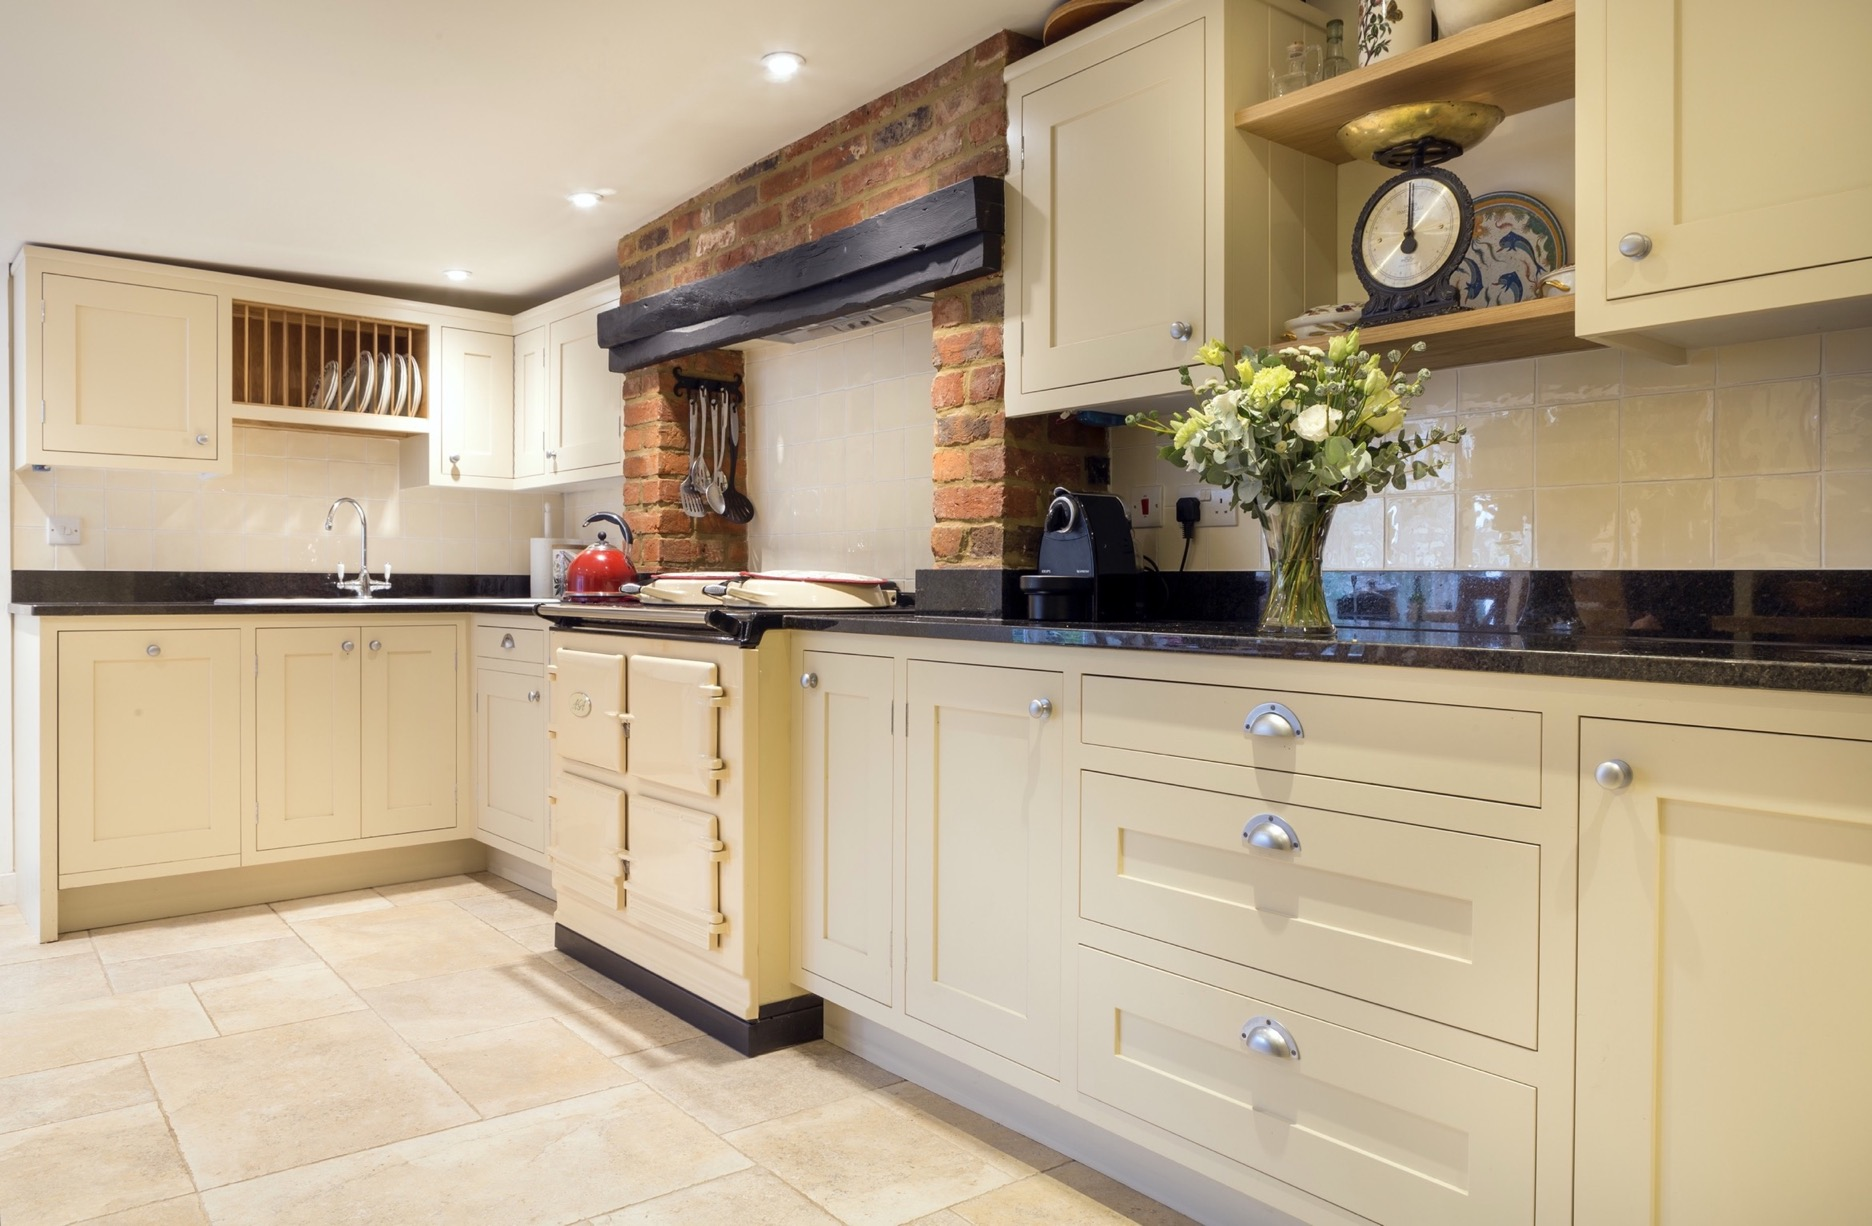 Handpainted kitchen Aga range cooker granite worktop amersham buckinghamshire bespoke kitchen inframe 2 2